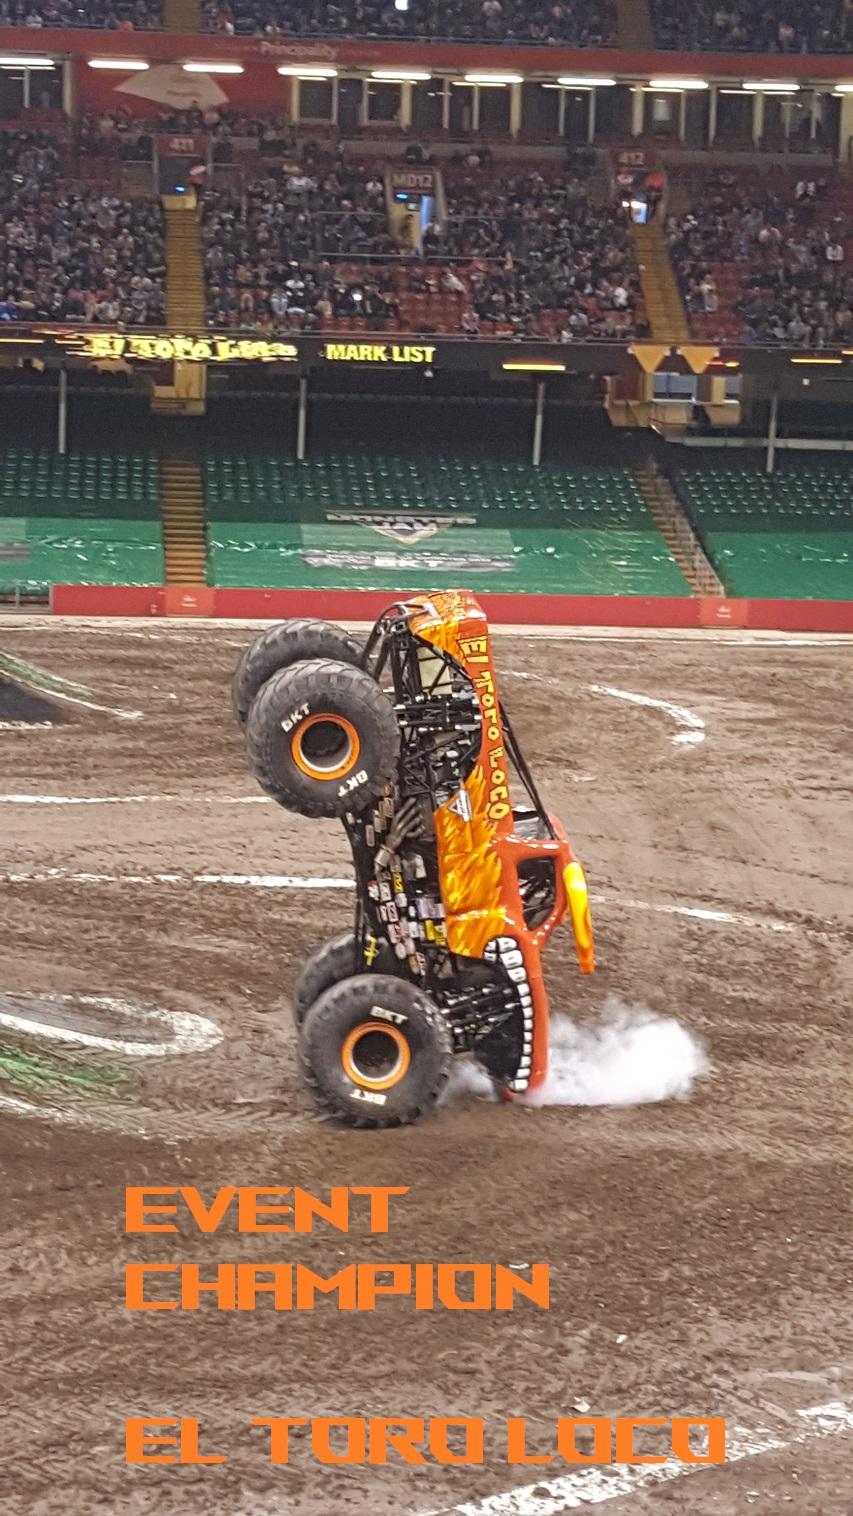 EVENT CHAMPION  El Toro Loco Cardiff Monster Trucks 2019